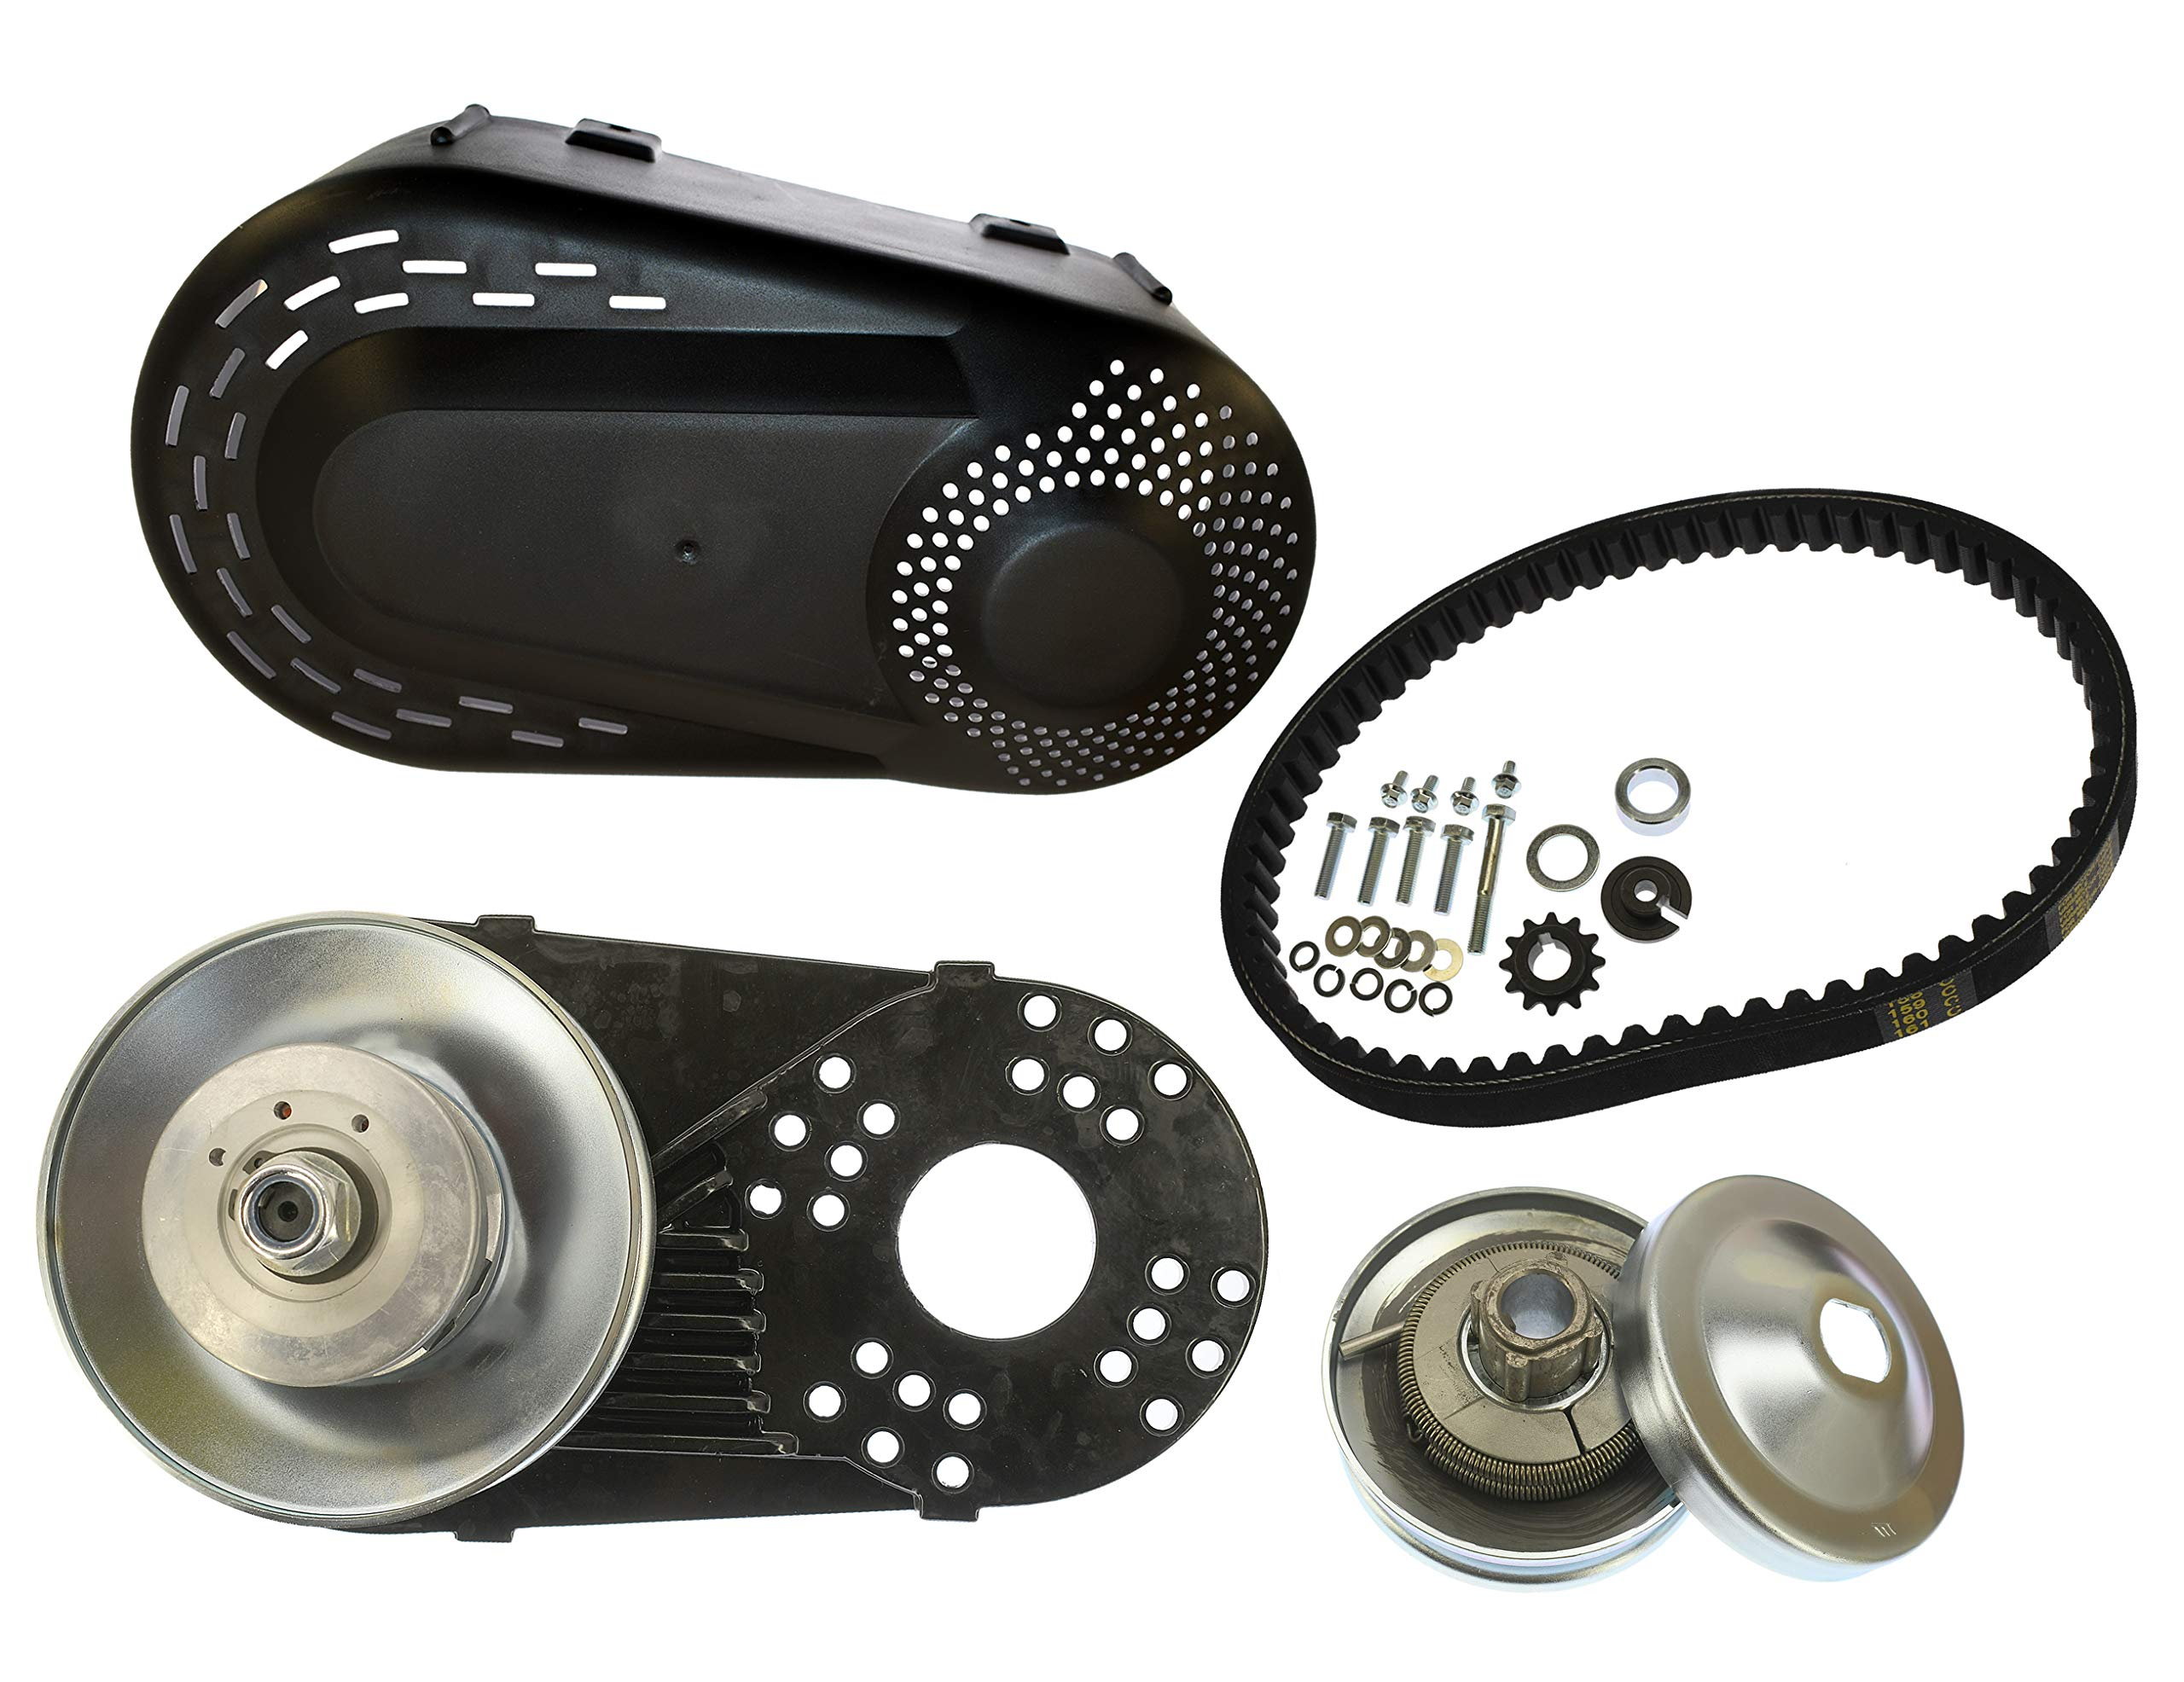 GoPowerSports Go Kart Mini Bike Torque Converter Kit, Replacement kit for the Comet TAV2 218353, Works on Predator engines